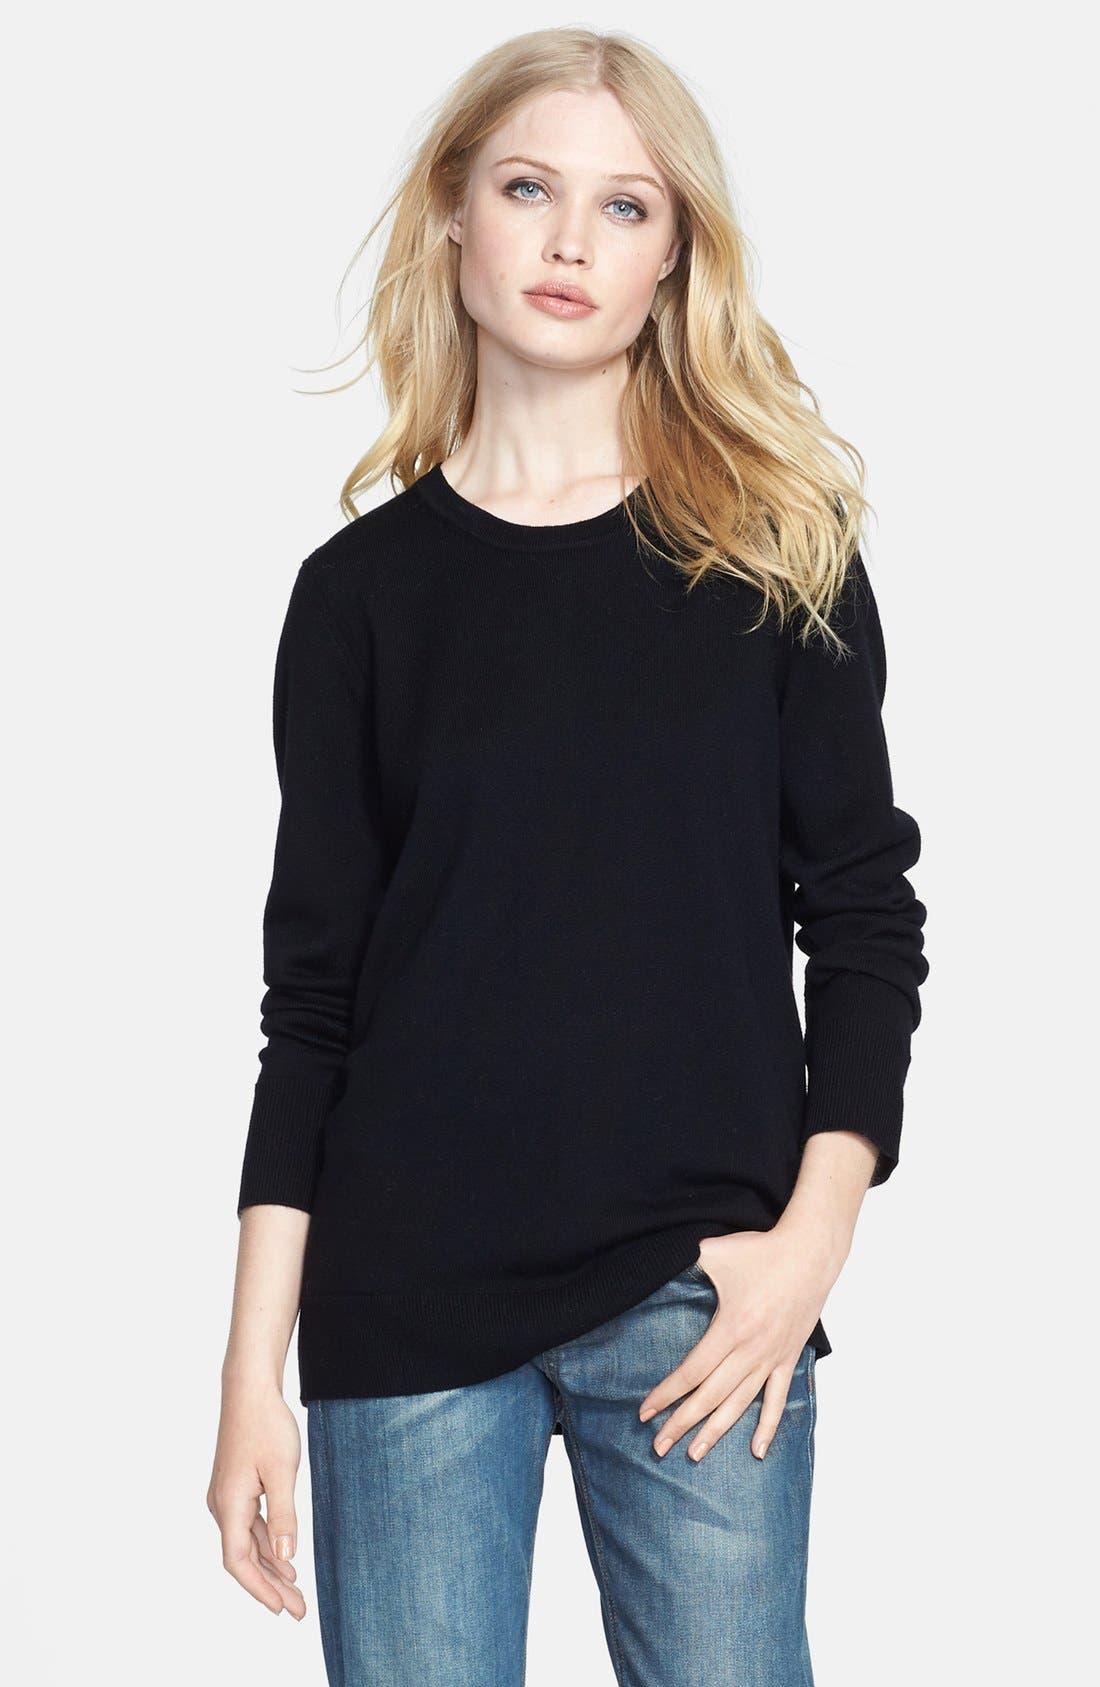 RAG & BONE JEAN 'Natalie' Sweater, Main, color, 001